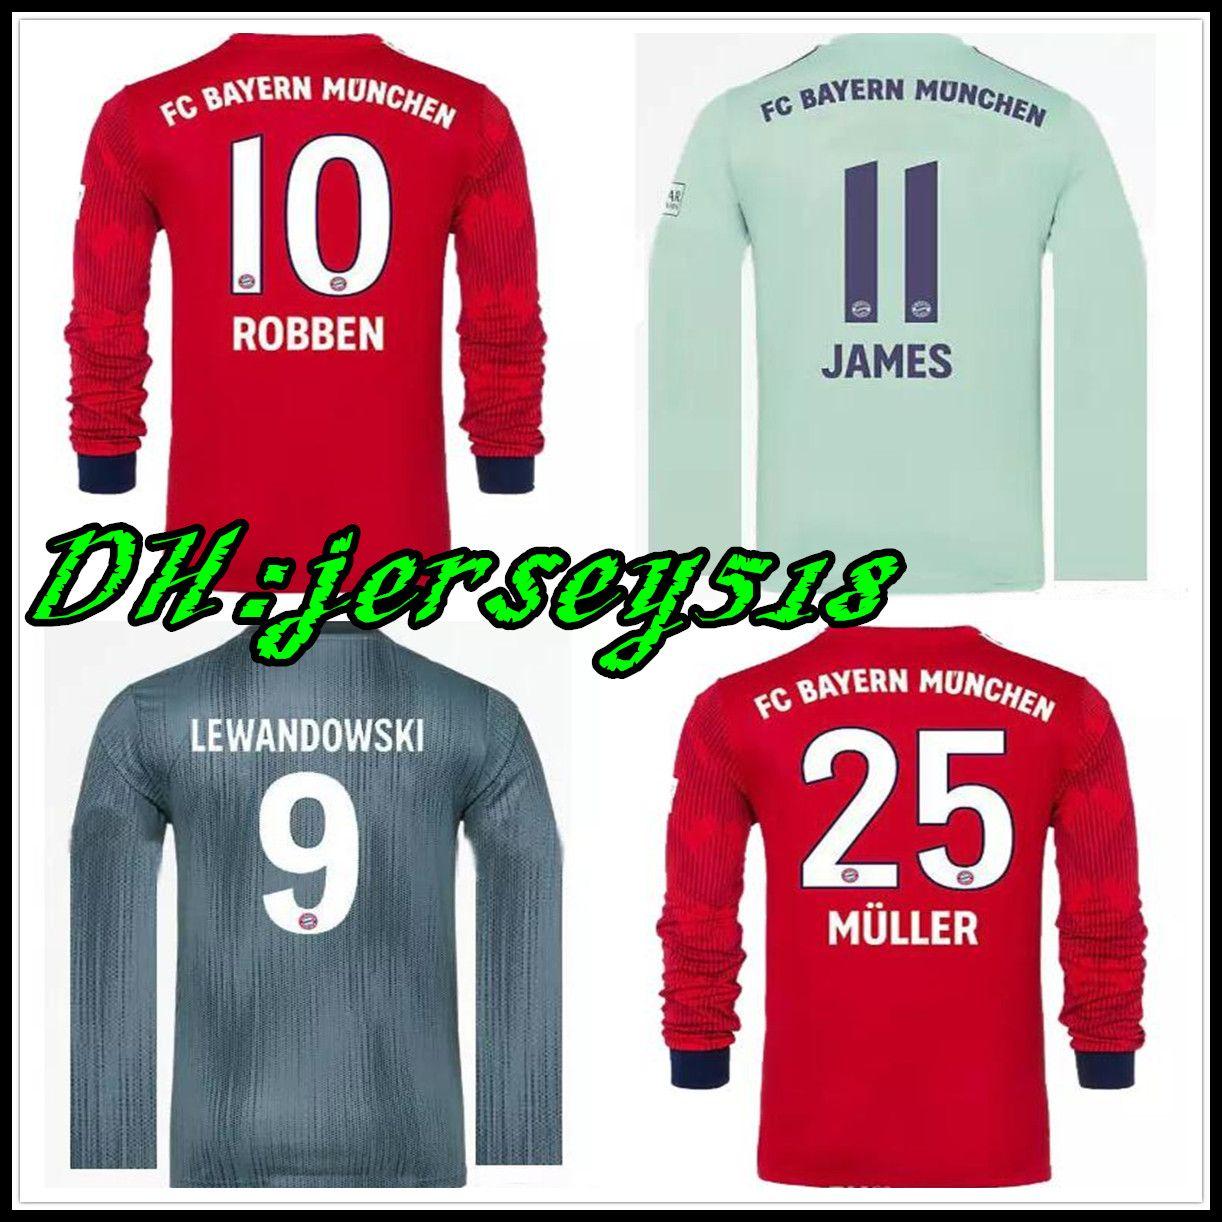 18 19 Camiseta De Manga Larga Bayern Munich Soccer 2018 2019 James KIMMICH  VIDAL LEWANDOWSKI MULLER HOMBRAS TOLISSO Camisetas Kimmich Por Ruohan518 2797f2321e1ca